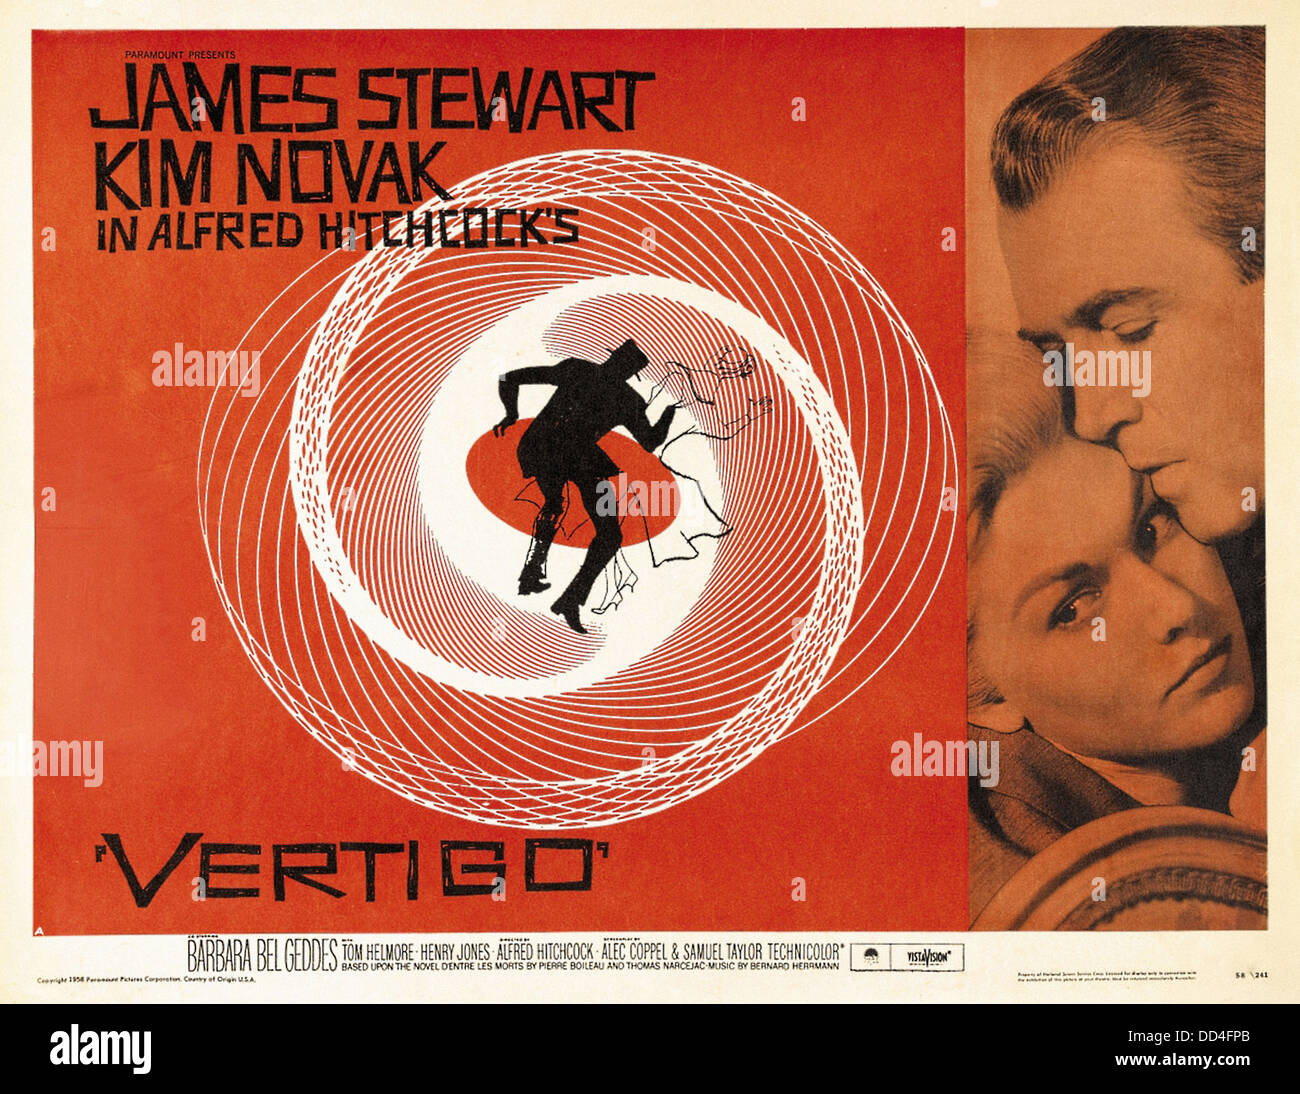 24x36 Vertigo Alfred Hitchcock Vintage Movie Poster